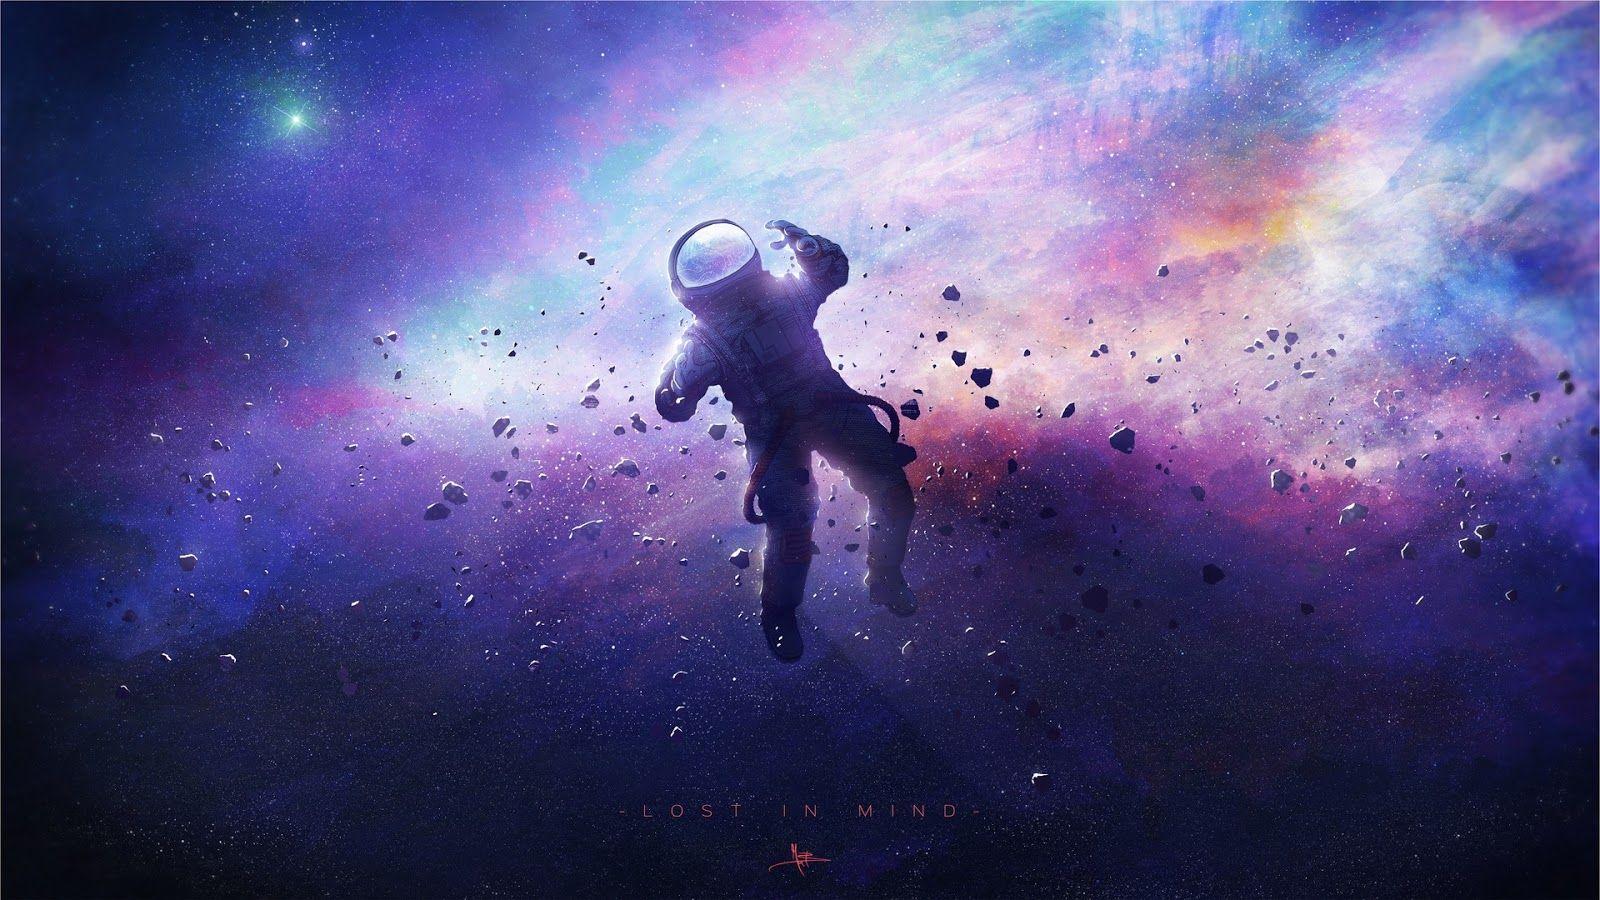 Astronaut Dream Galaxy Stars Suit Hd Space Astronaut Wallpaper Outer Space Wallpaper Hd Space